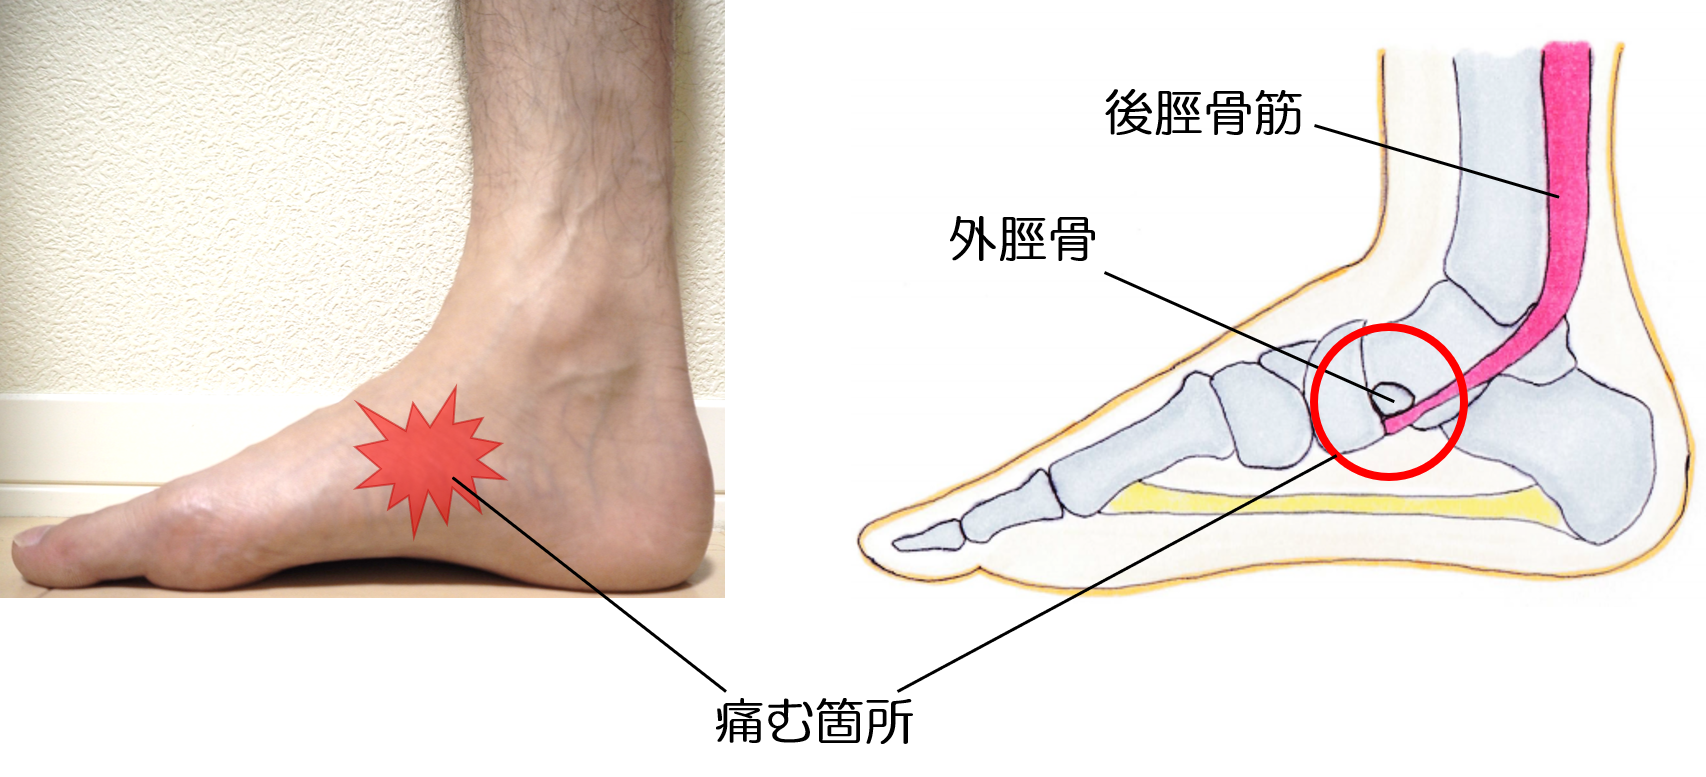 有痛性外脛骨の画像